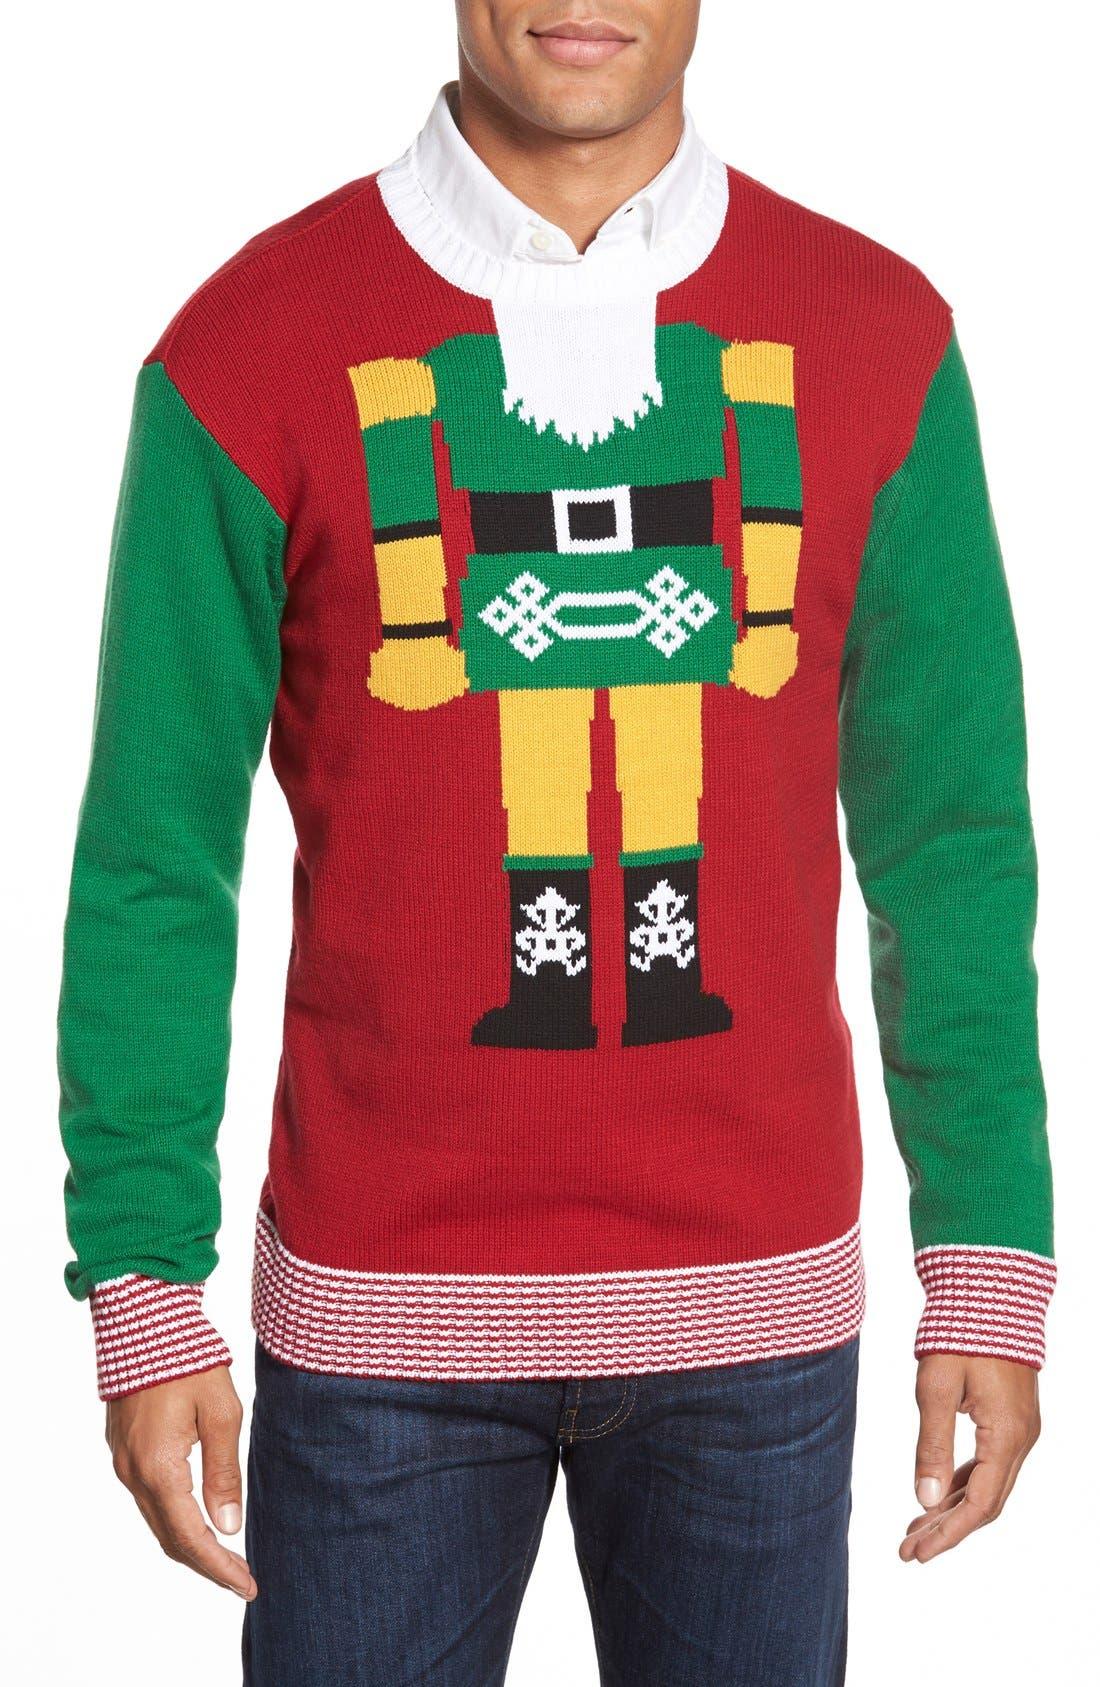 Main Image - Ugly Christmas Sweater 'Nutcracker Face' Holiday Crewneck Sweater